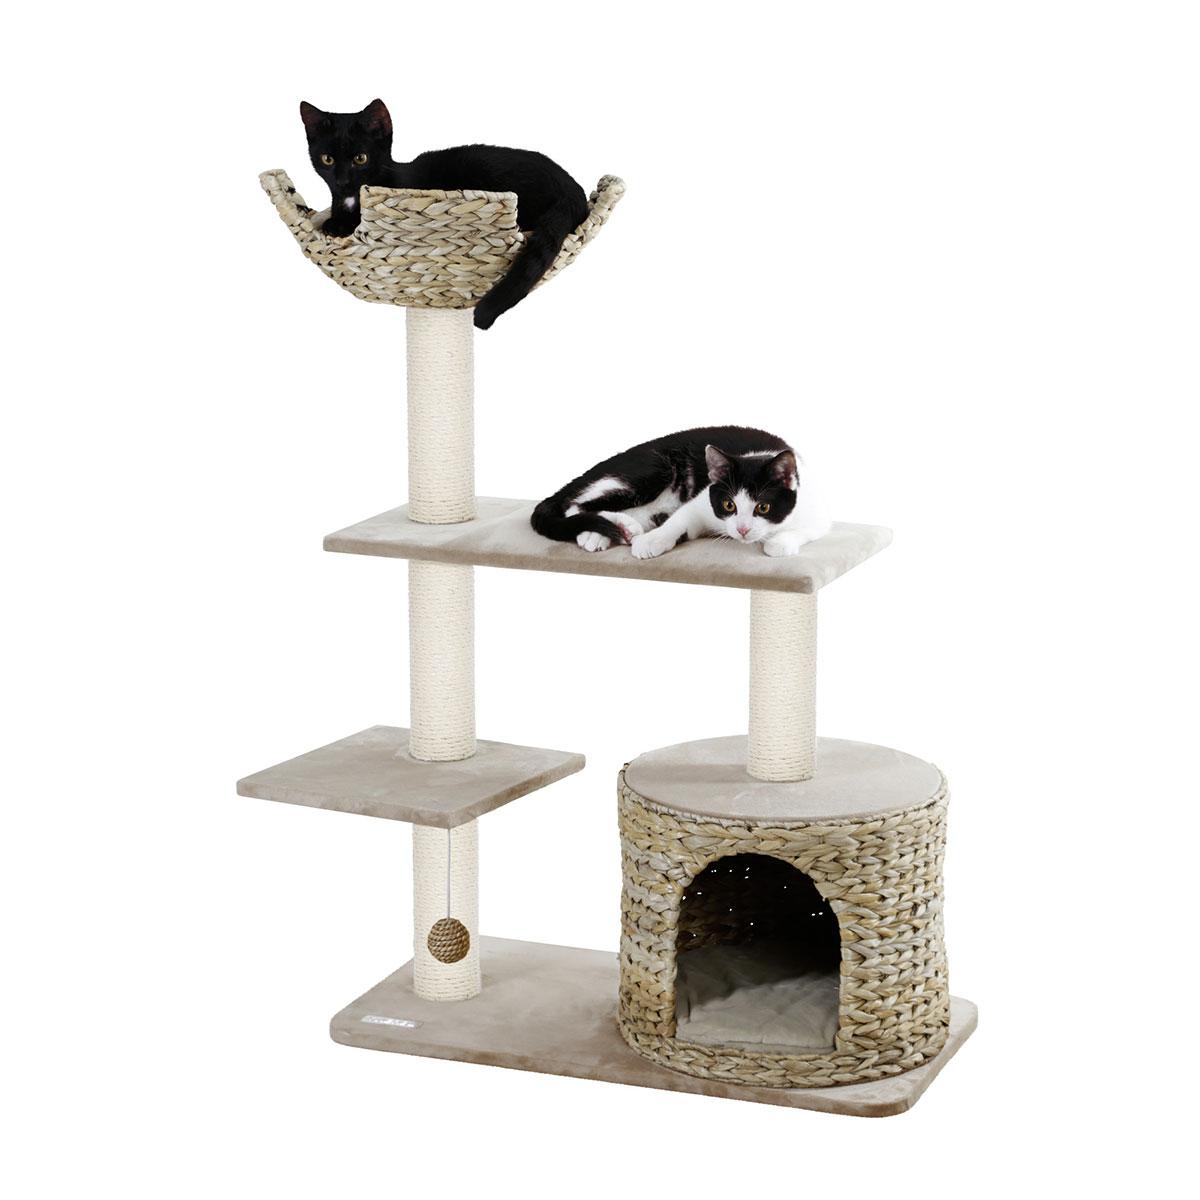 kerbl kratzbaum banana leaf jade g nstig kaufen bei zooroyal. Black Bedroom Furniture Sets. Home Design Ideas